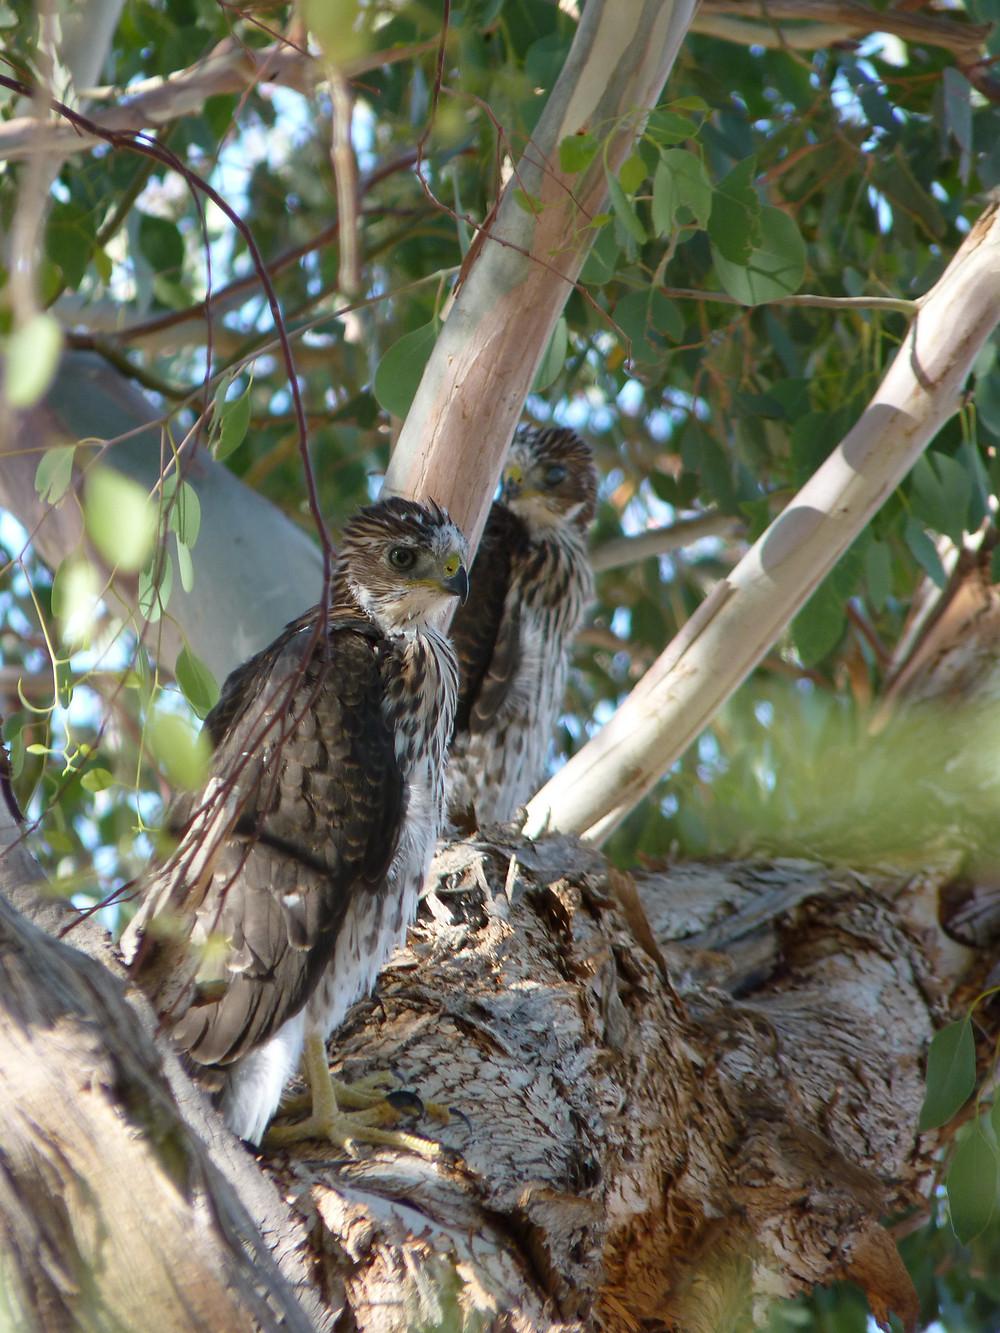 Juvenile Cooper's hawks